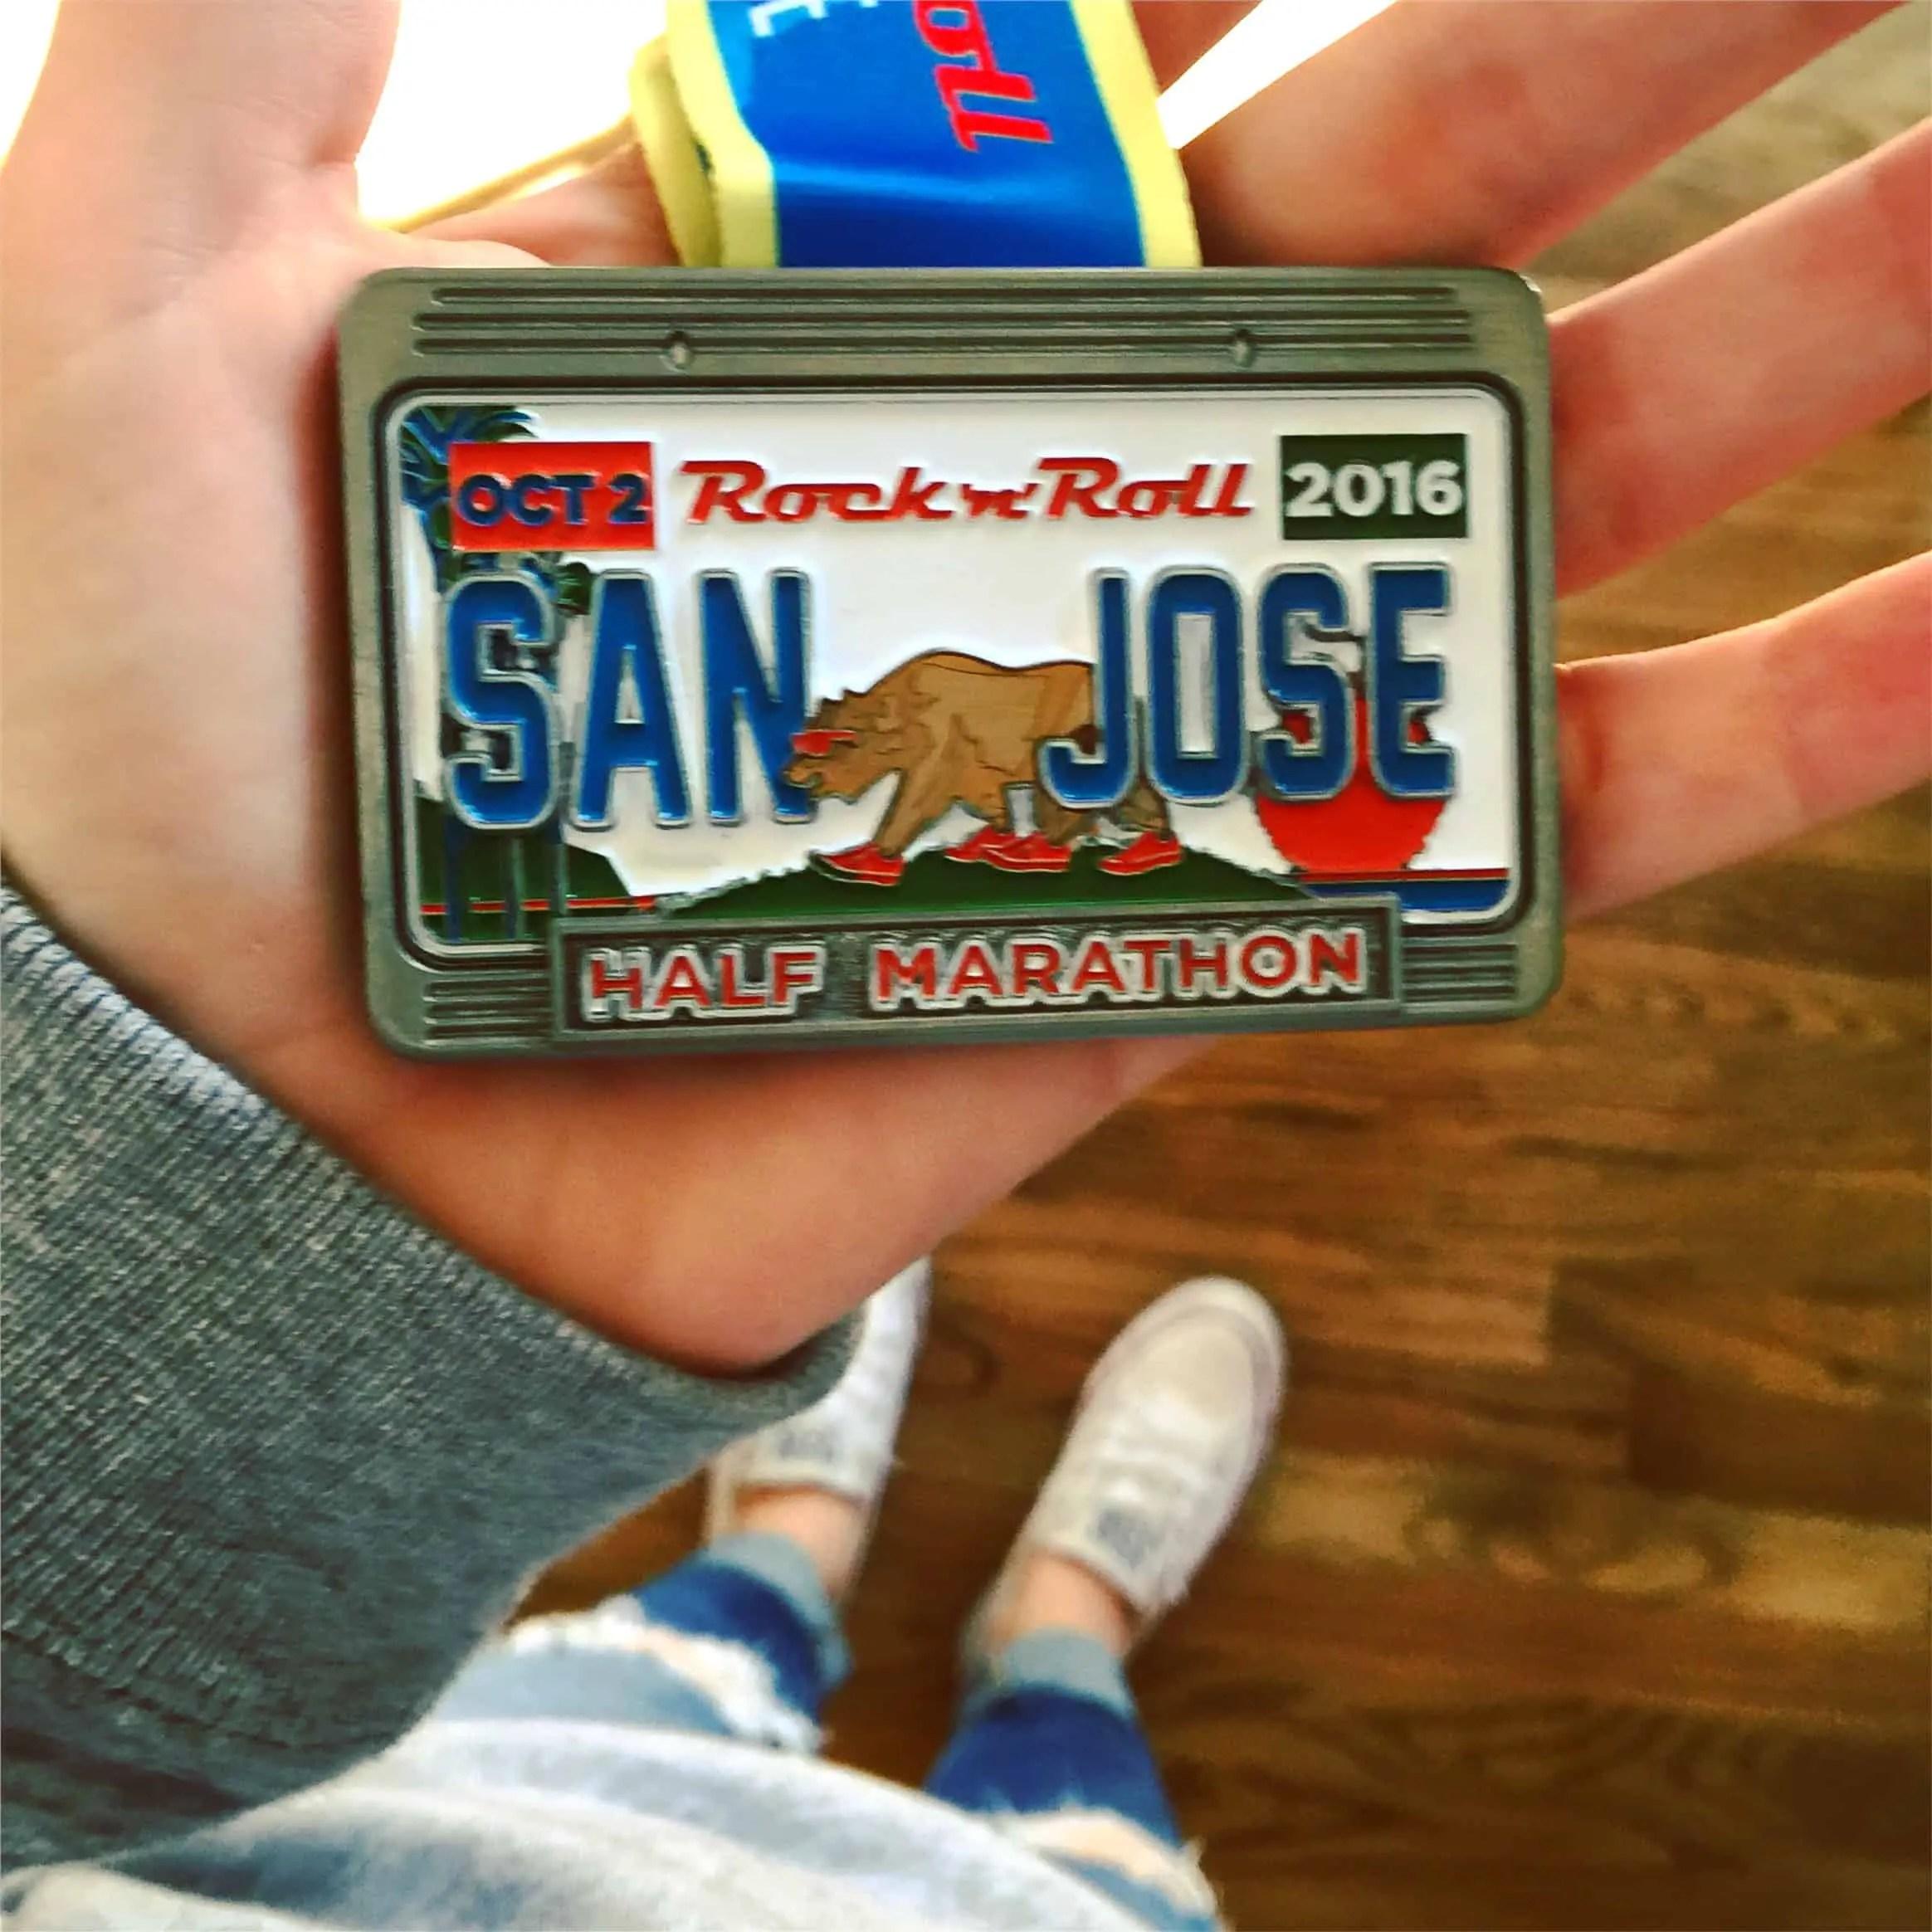 san jose medal